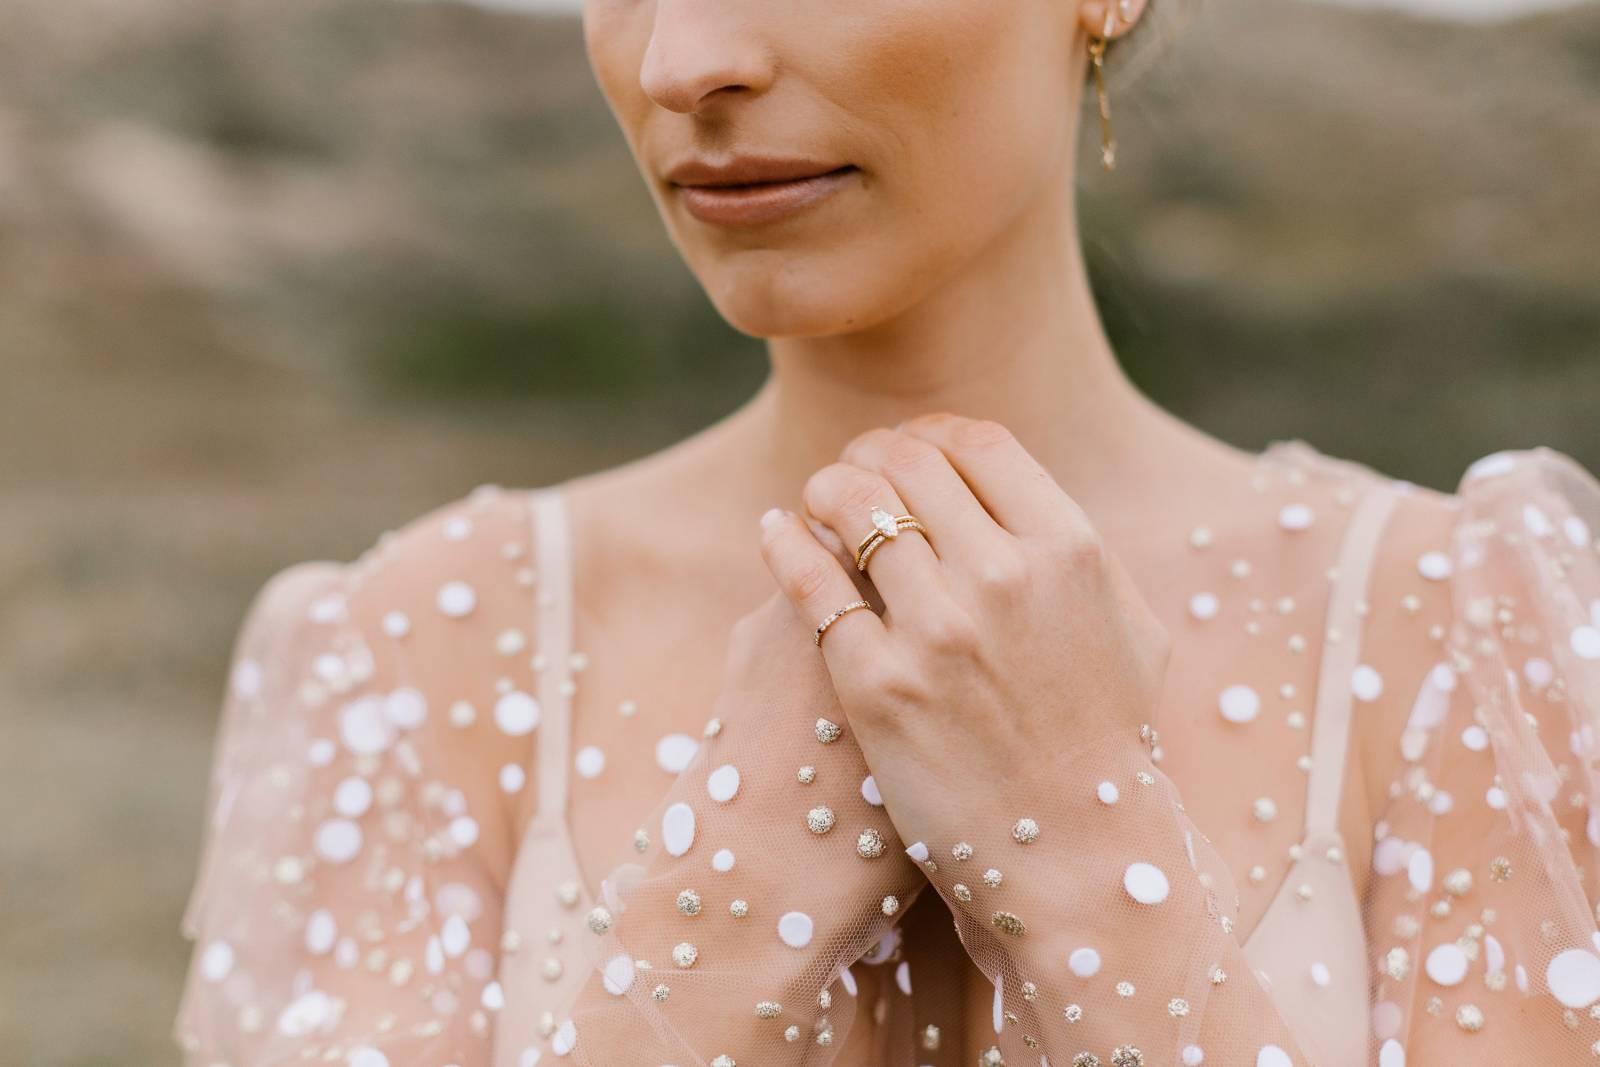 Elliot and Ostrich - Bruidsjuwelen - Trouwringen - Verlovingsringen - Fotograaf: Elodie Deceuninck - House of Weddings - 1